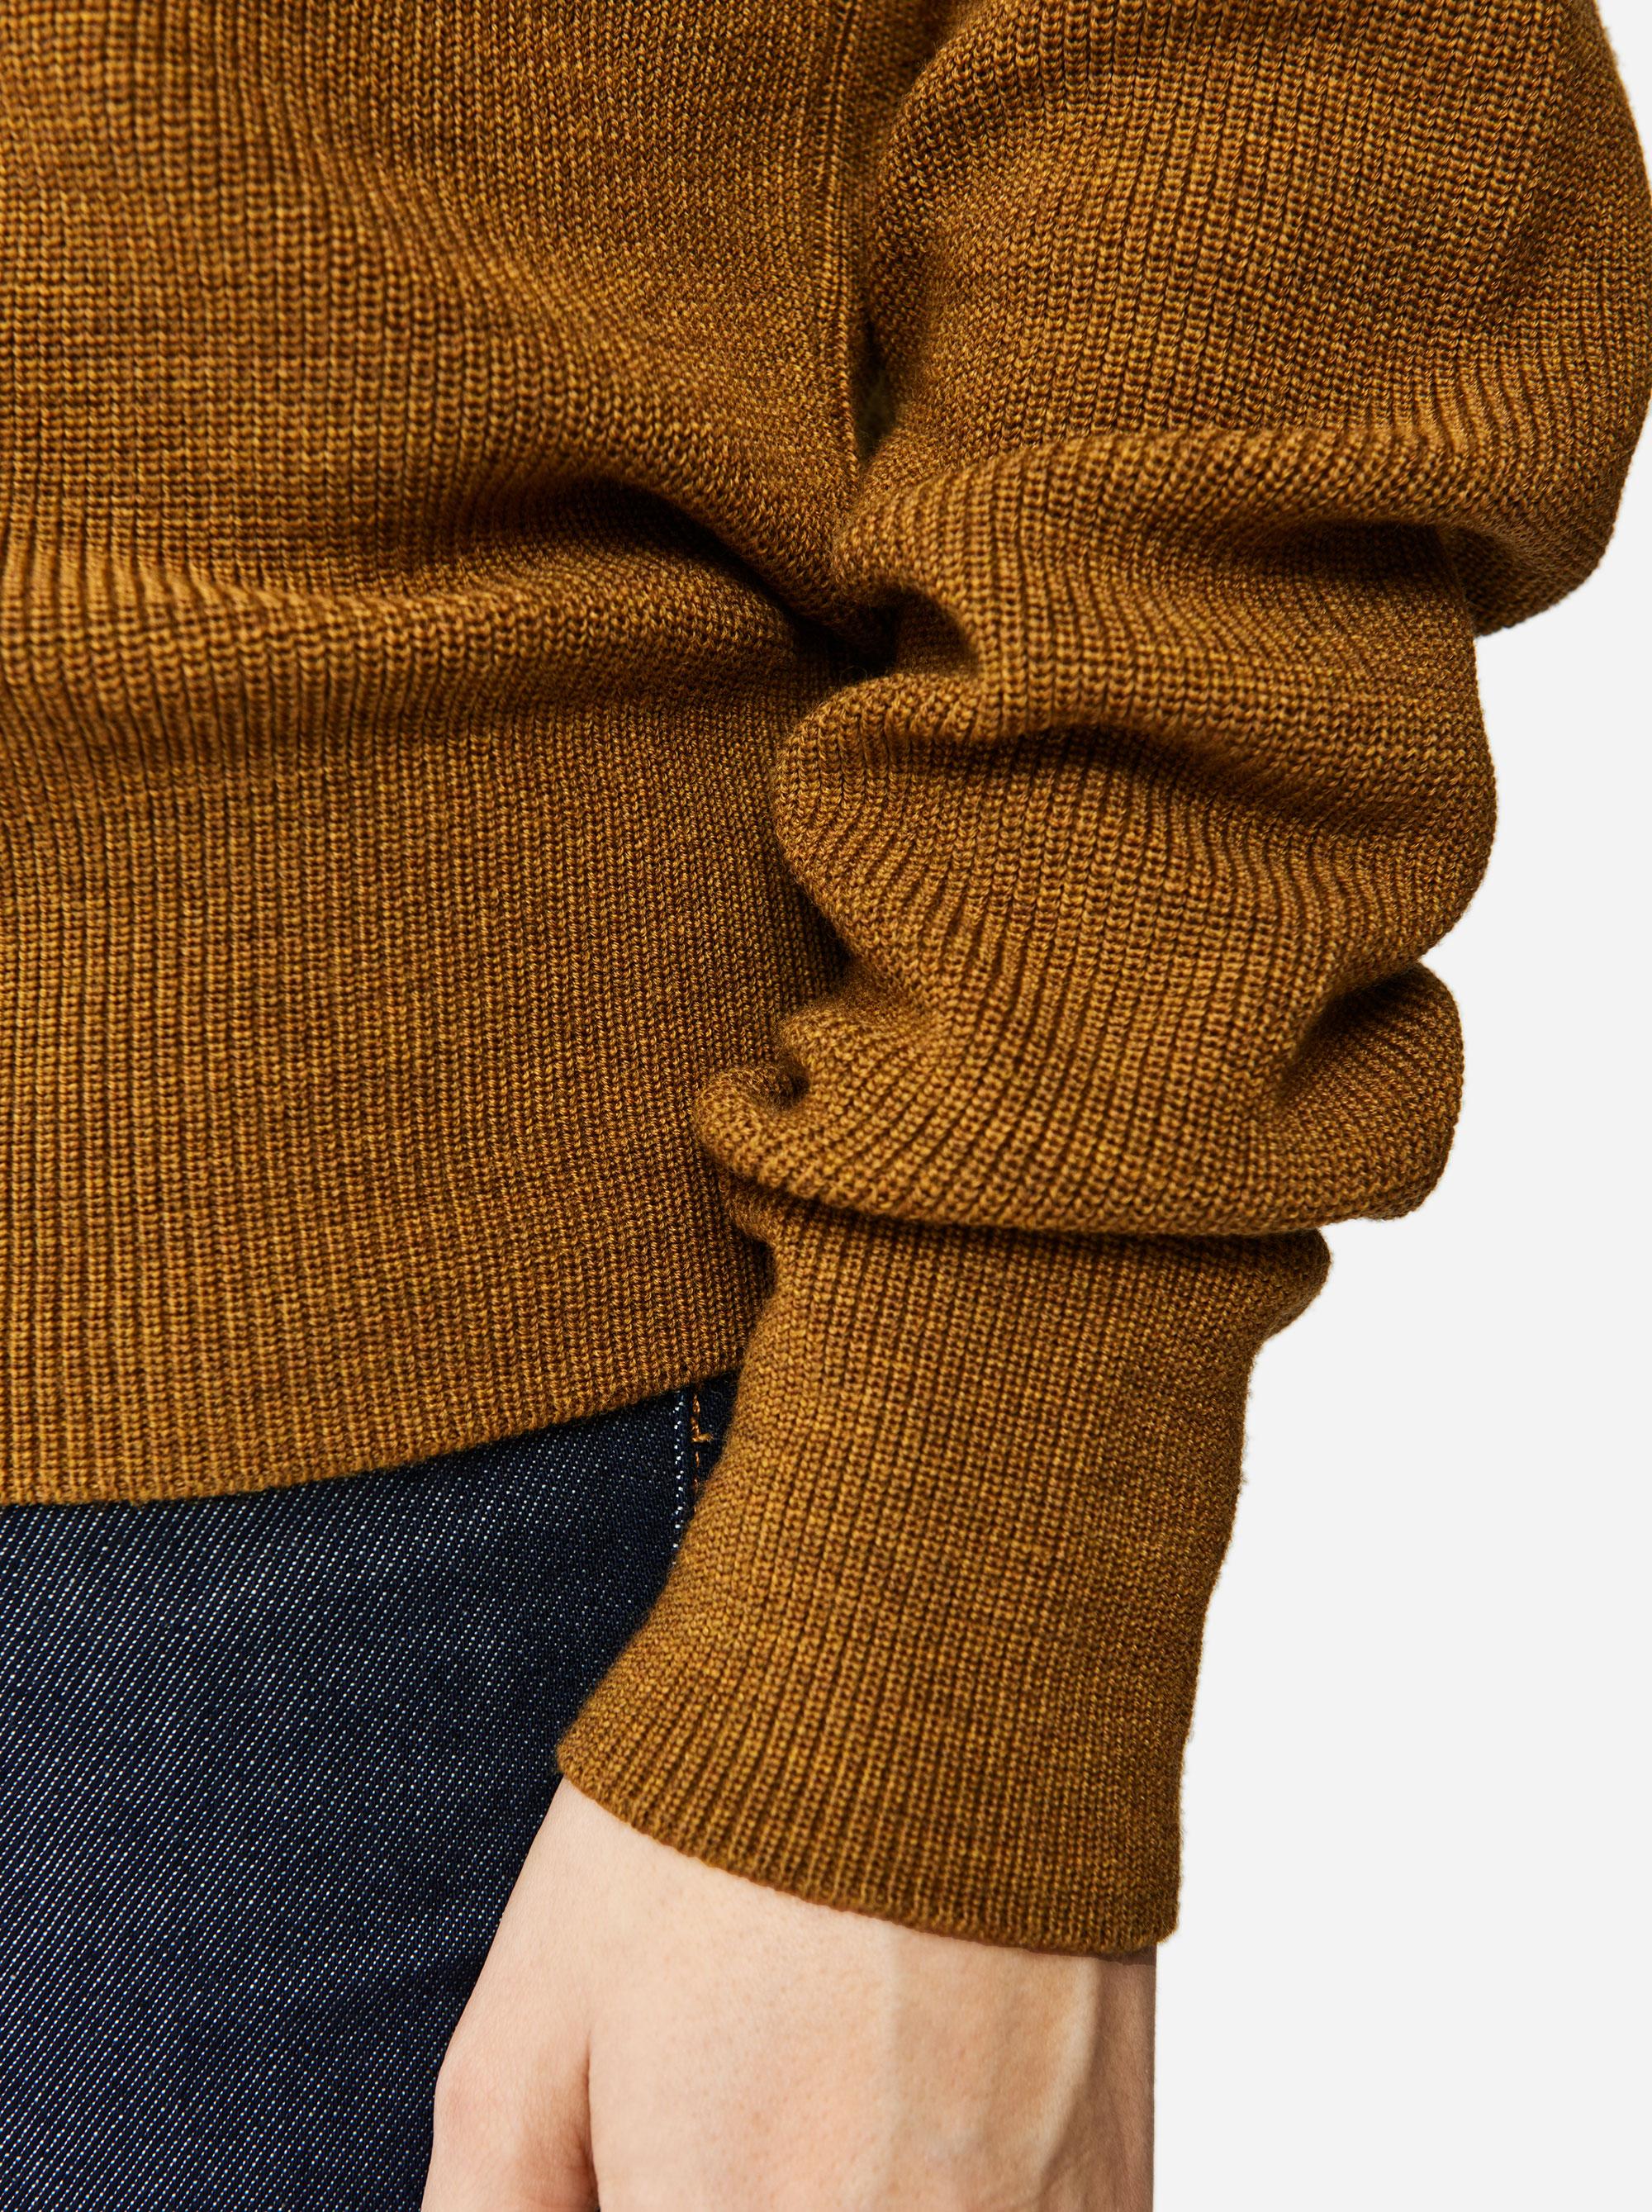 Teym - Crewneck - The Merino Sweater - Women - Mustard - 2